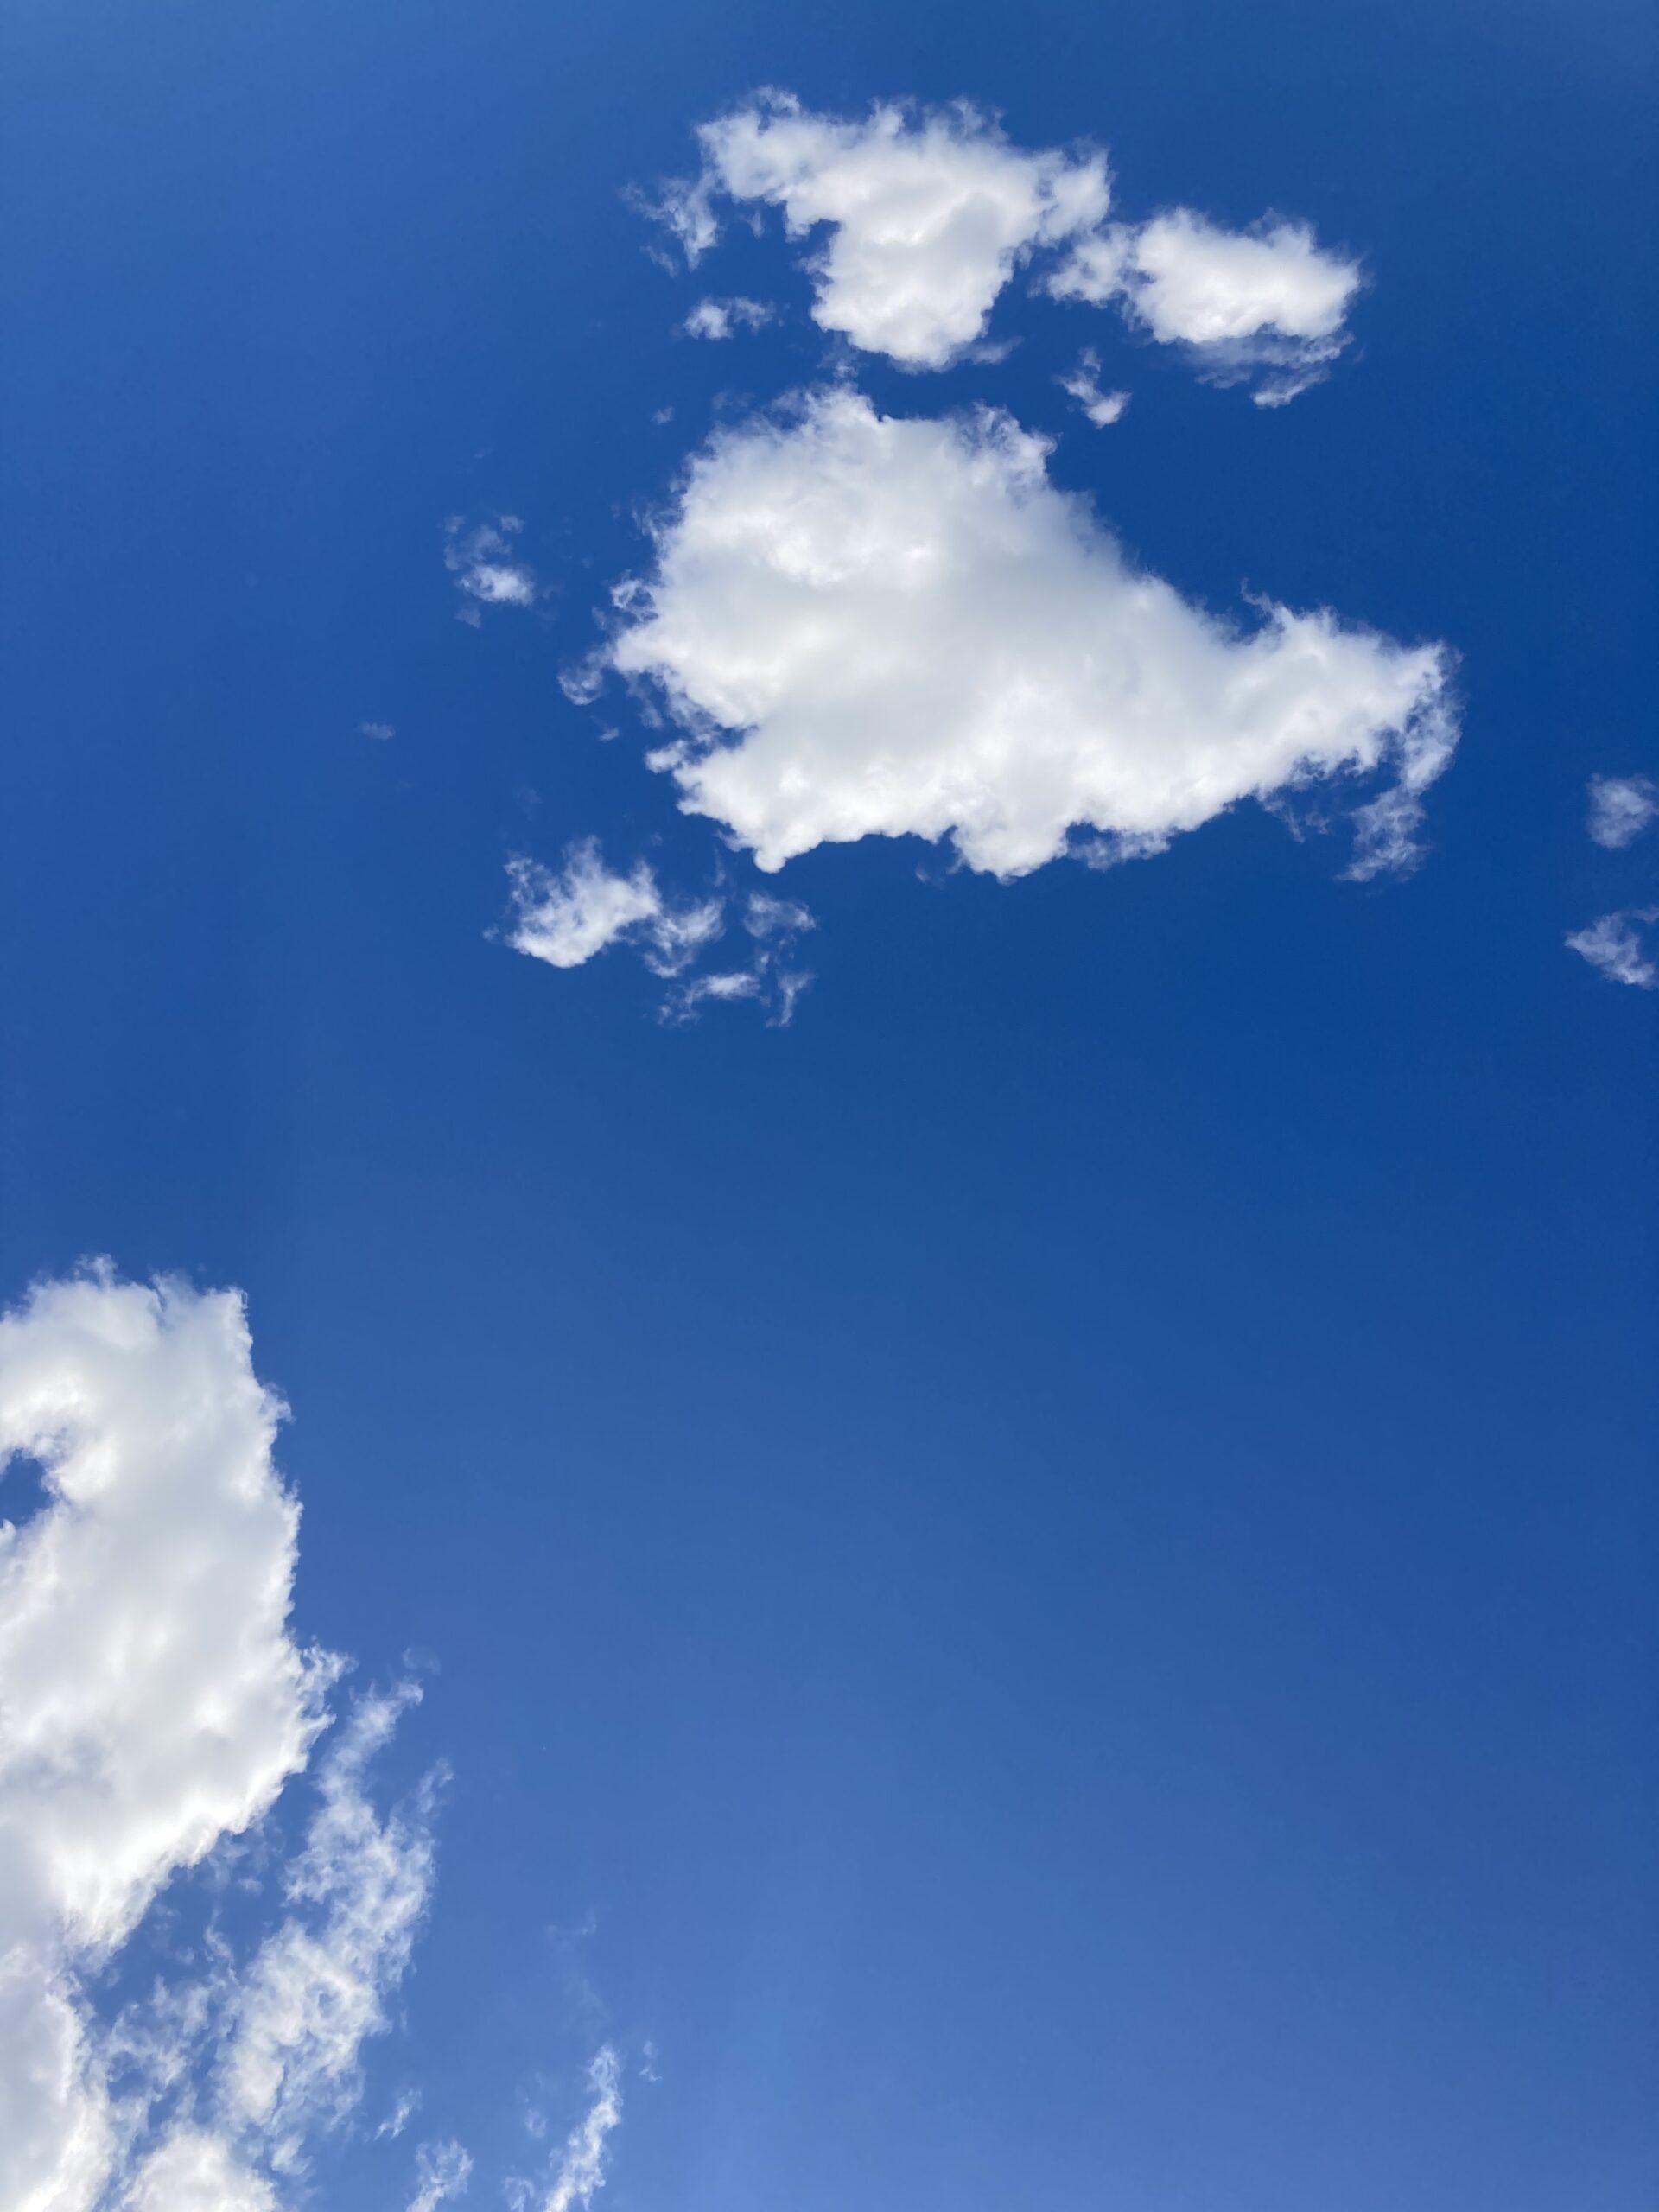 Tate Liverpool: Yoko Ono's T.V. to See The Sky